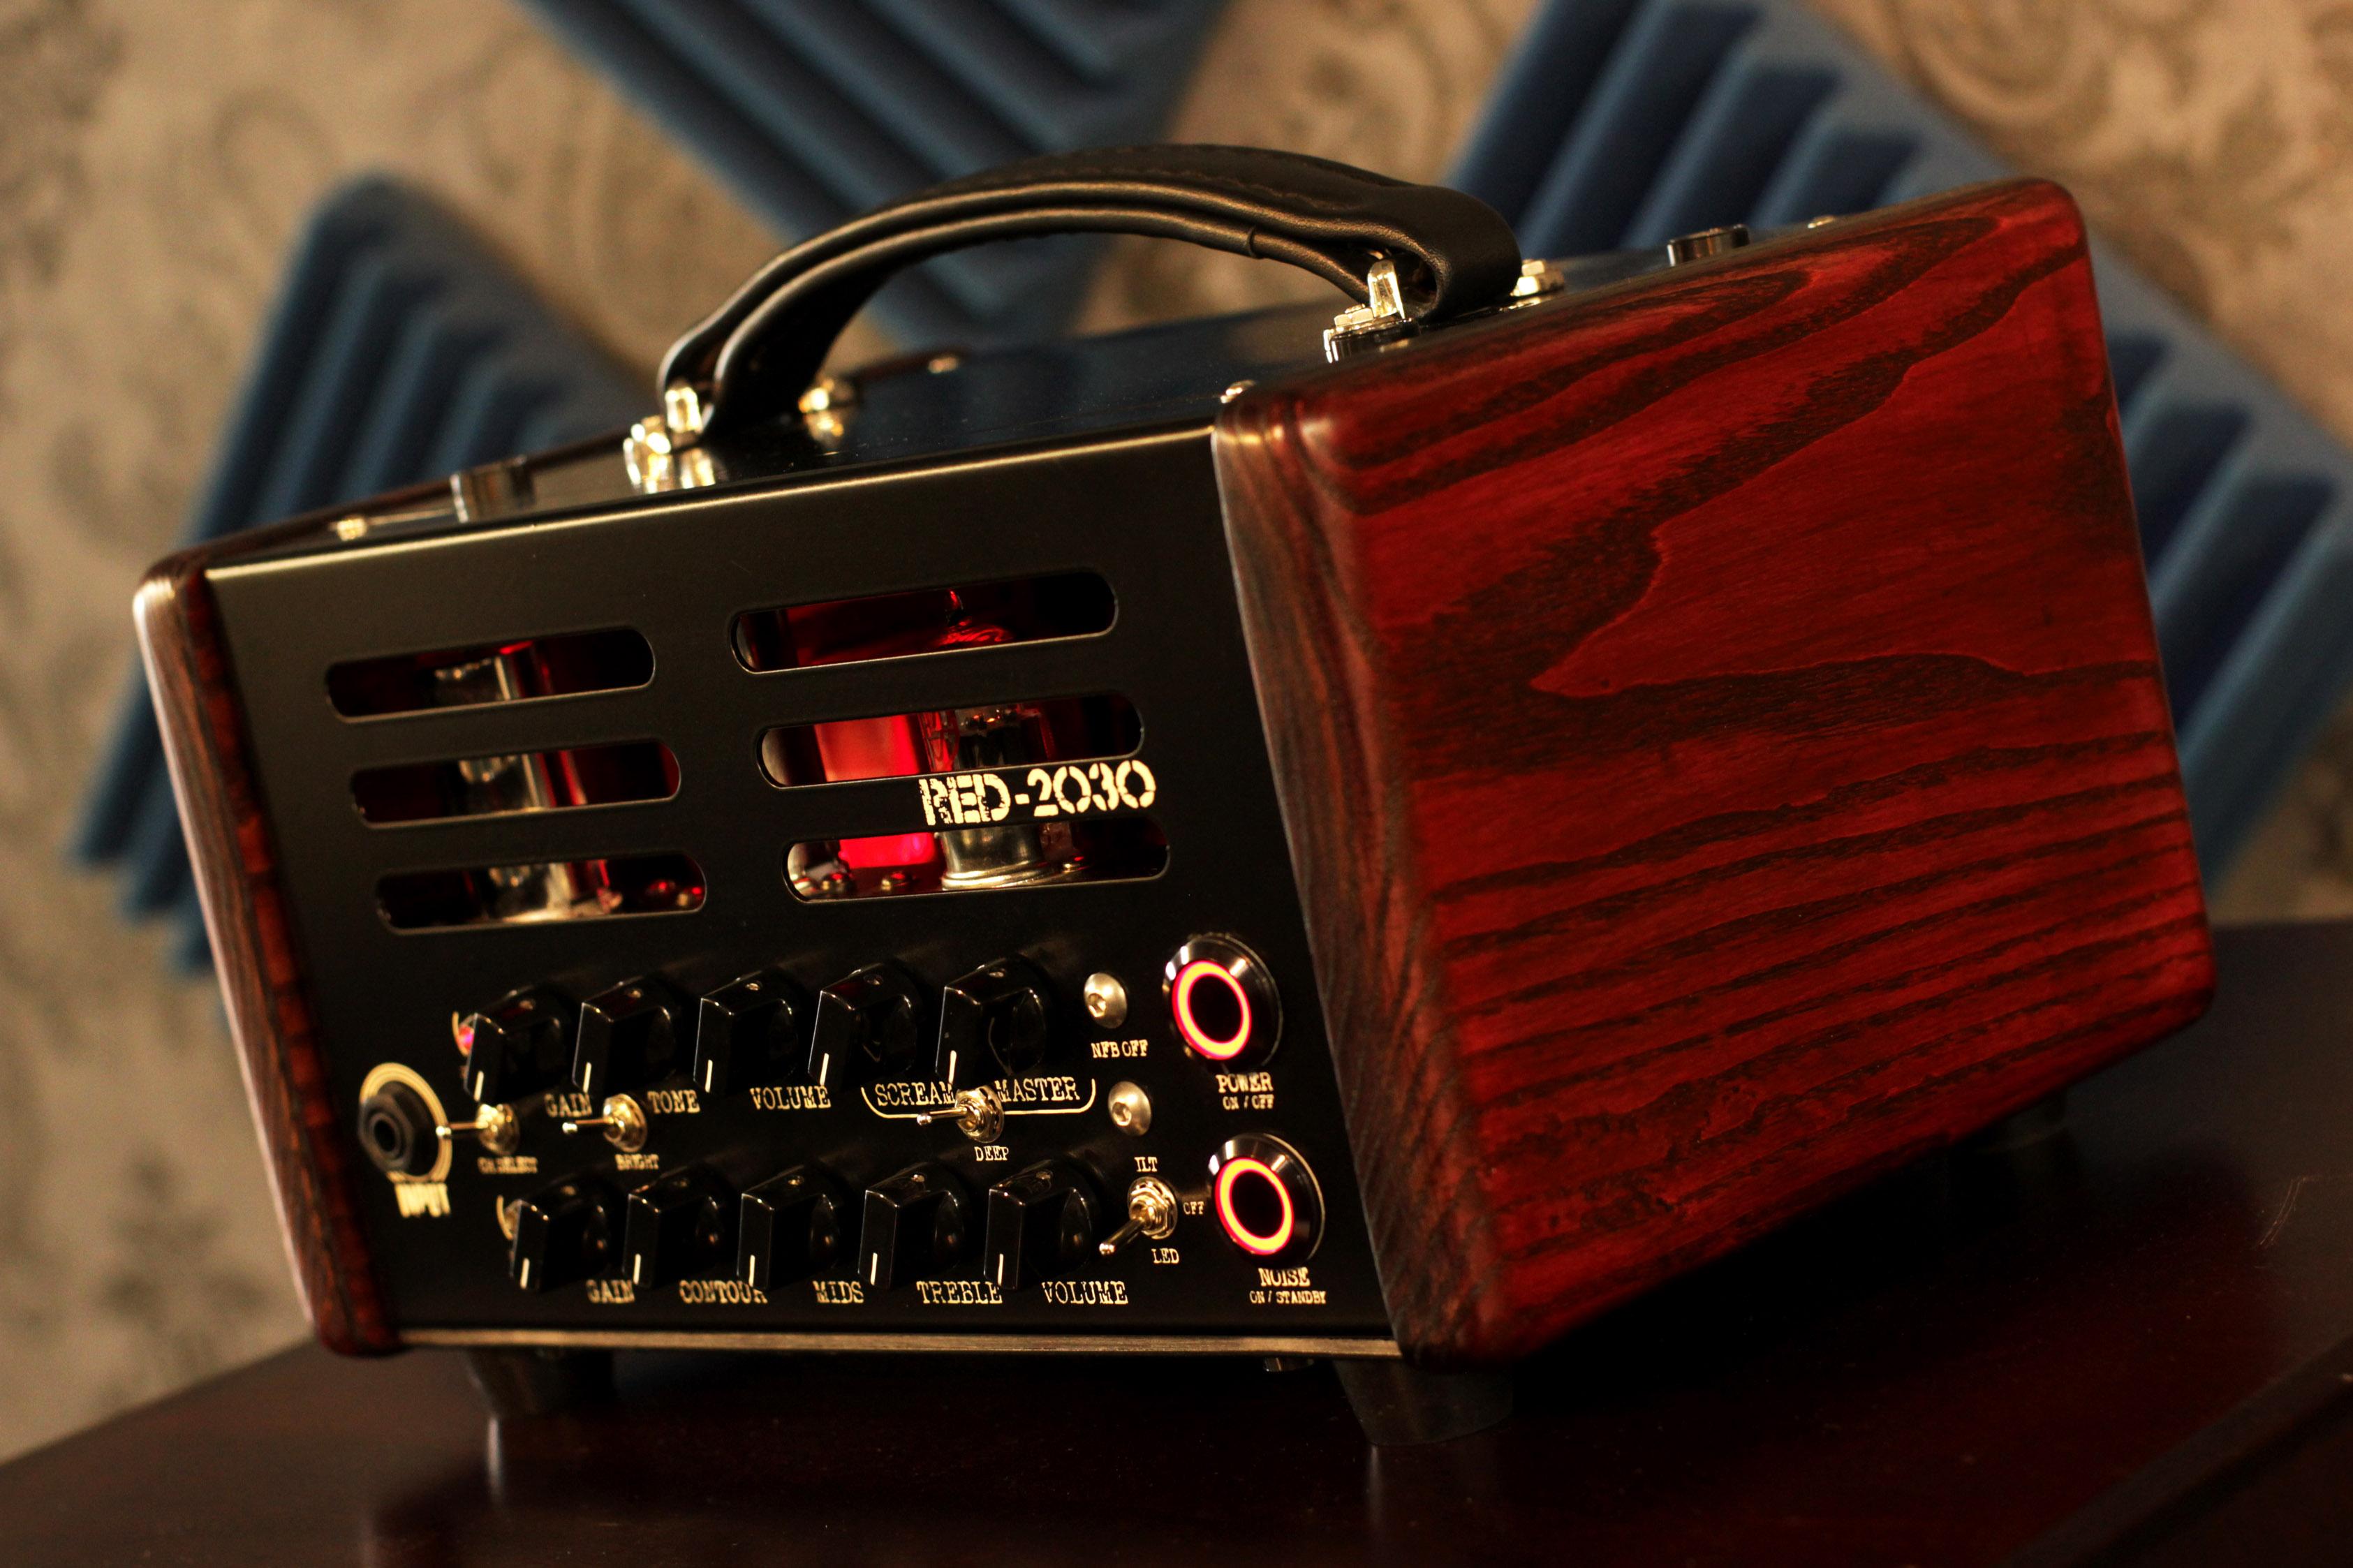 guitar tube amp, valve amp, metal amp, tube, high gain amp